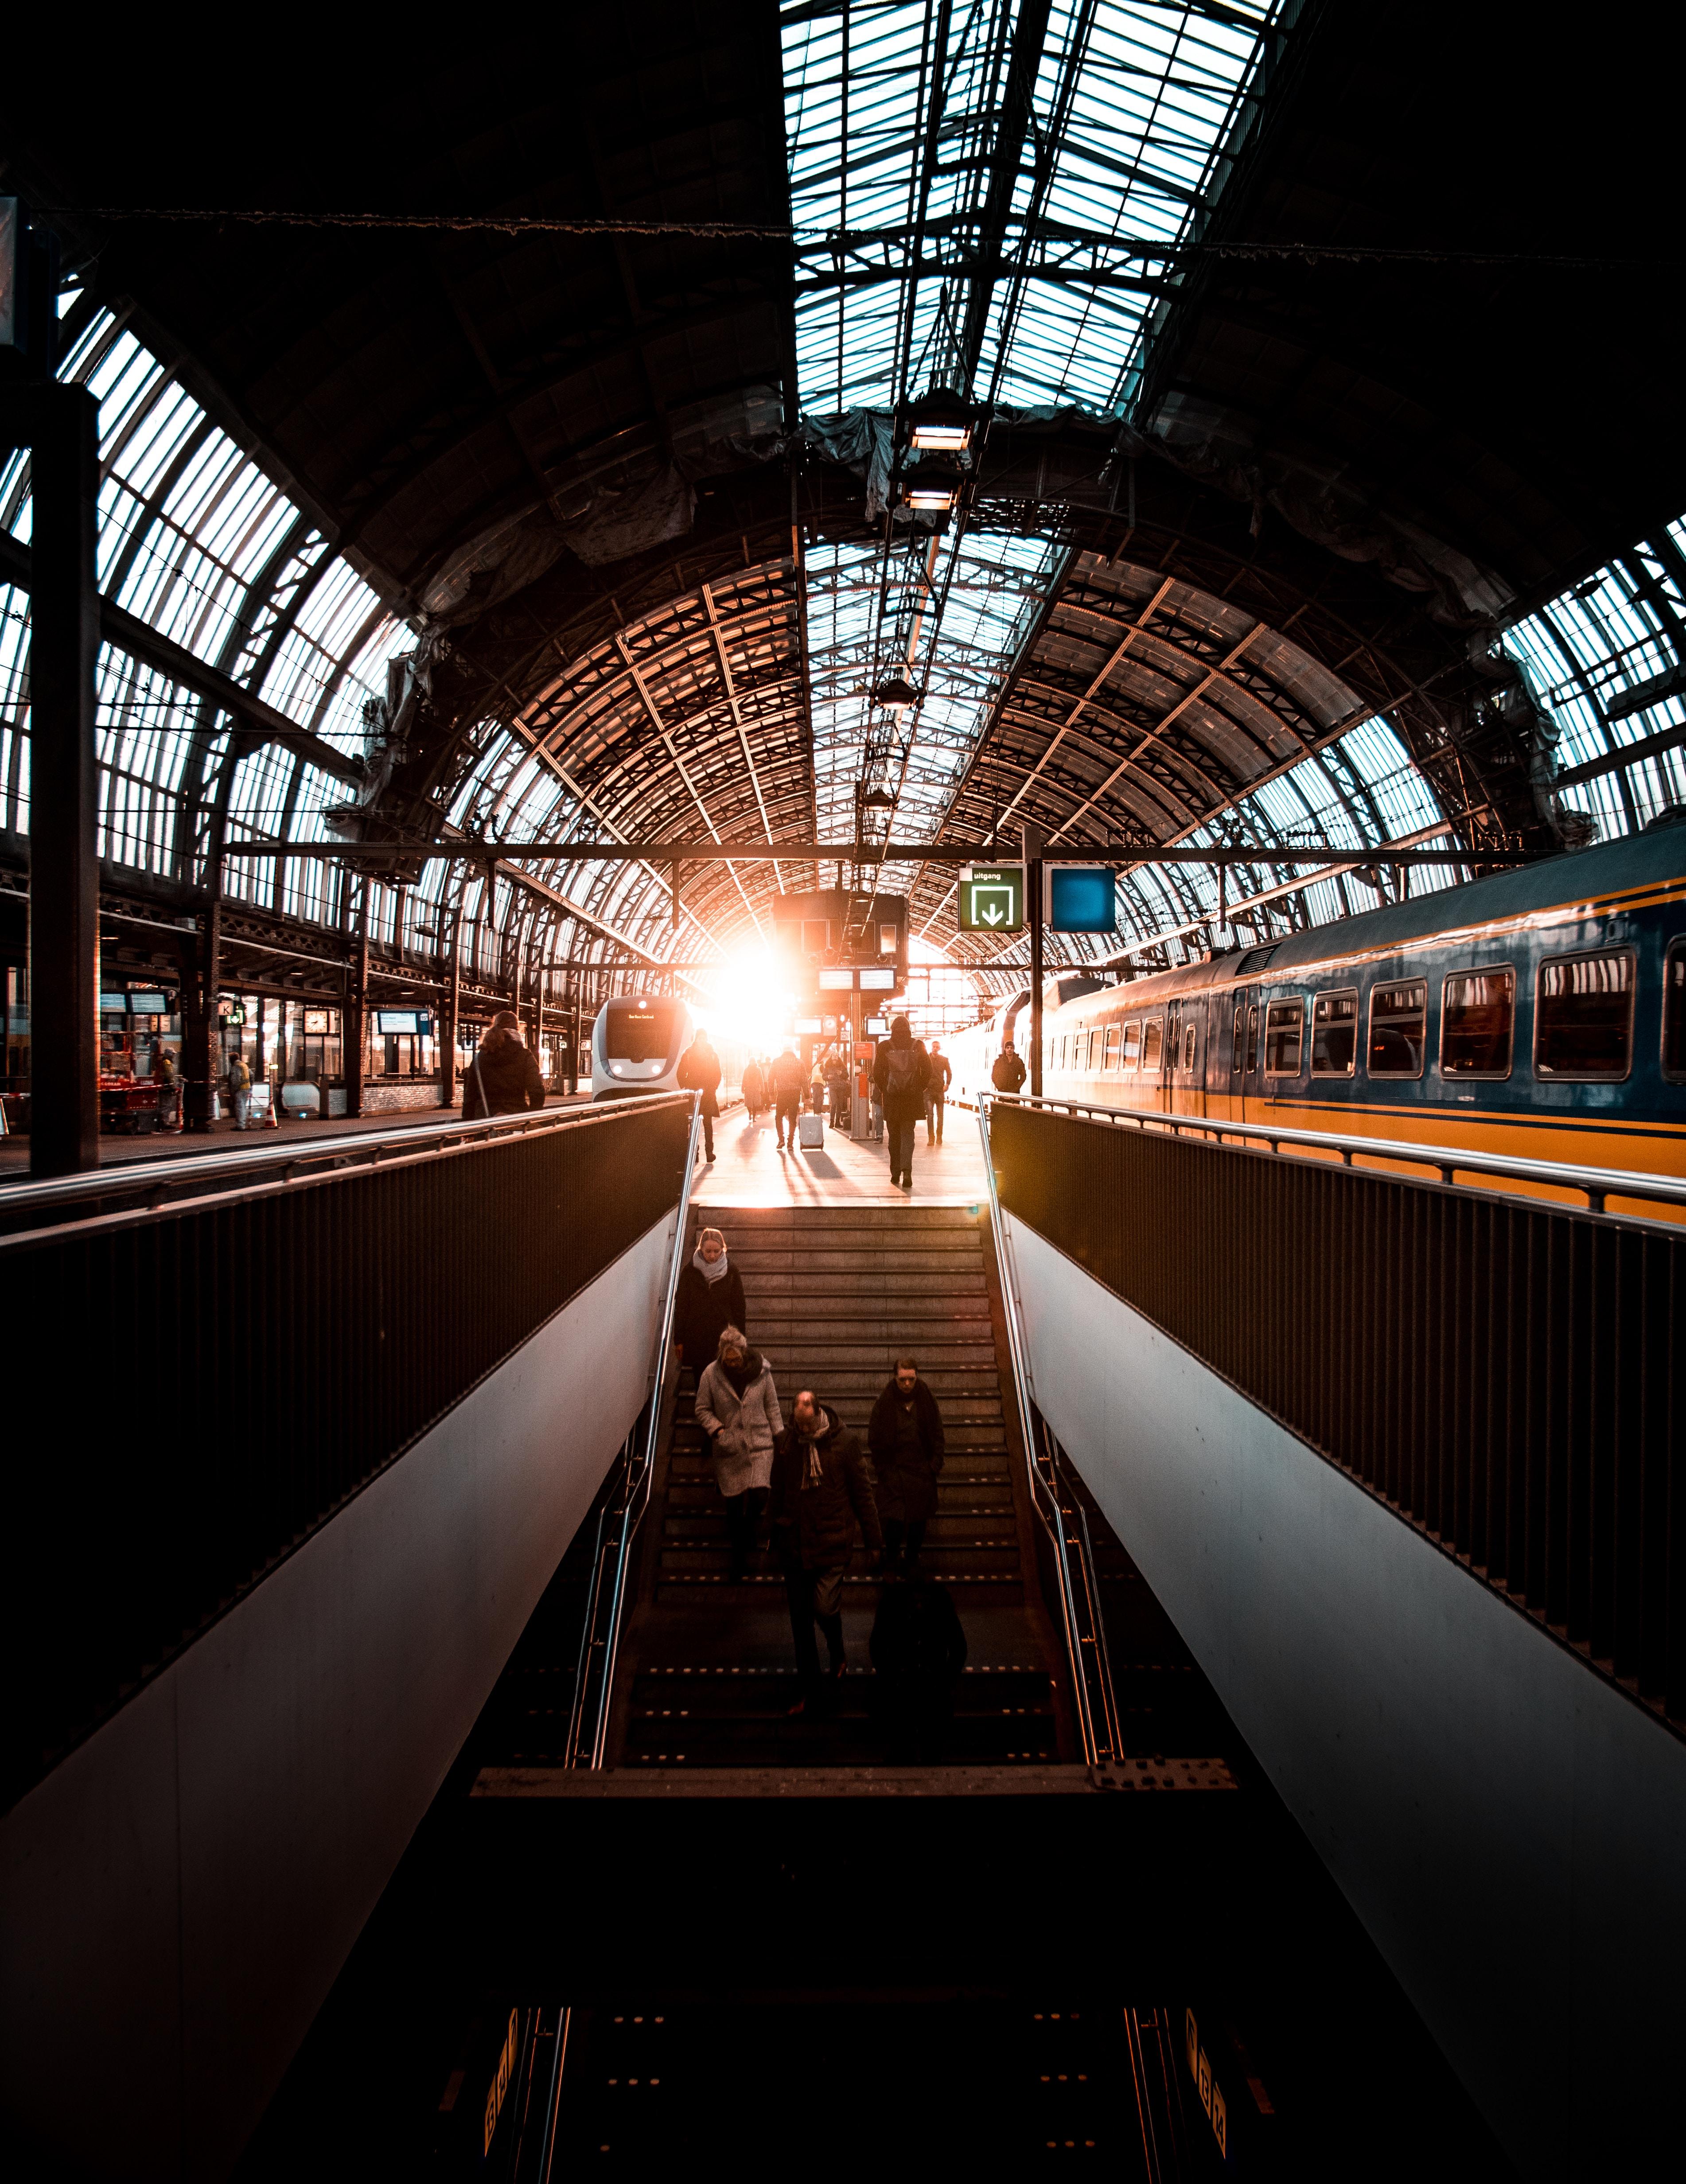 Train station. stories